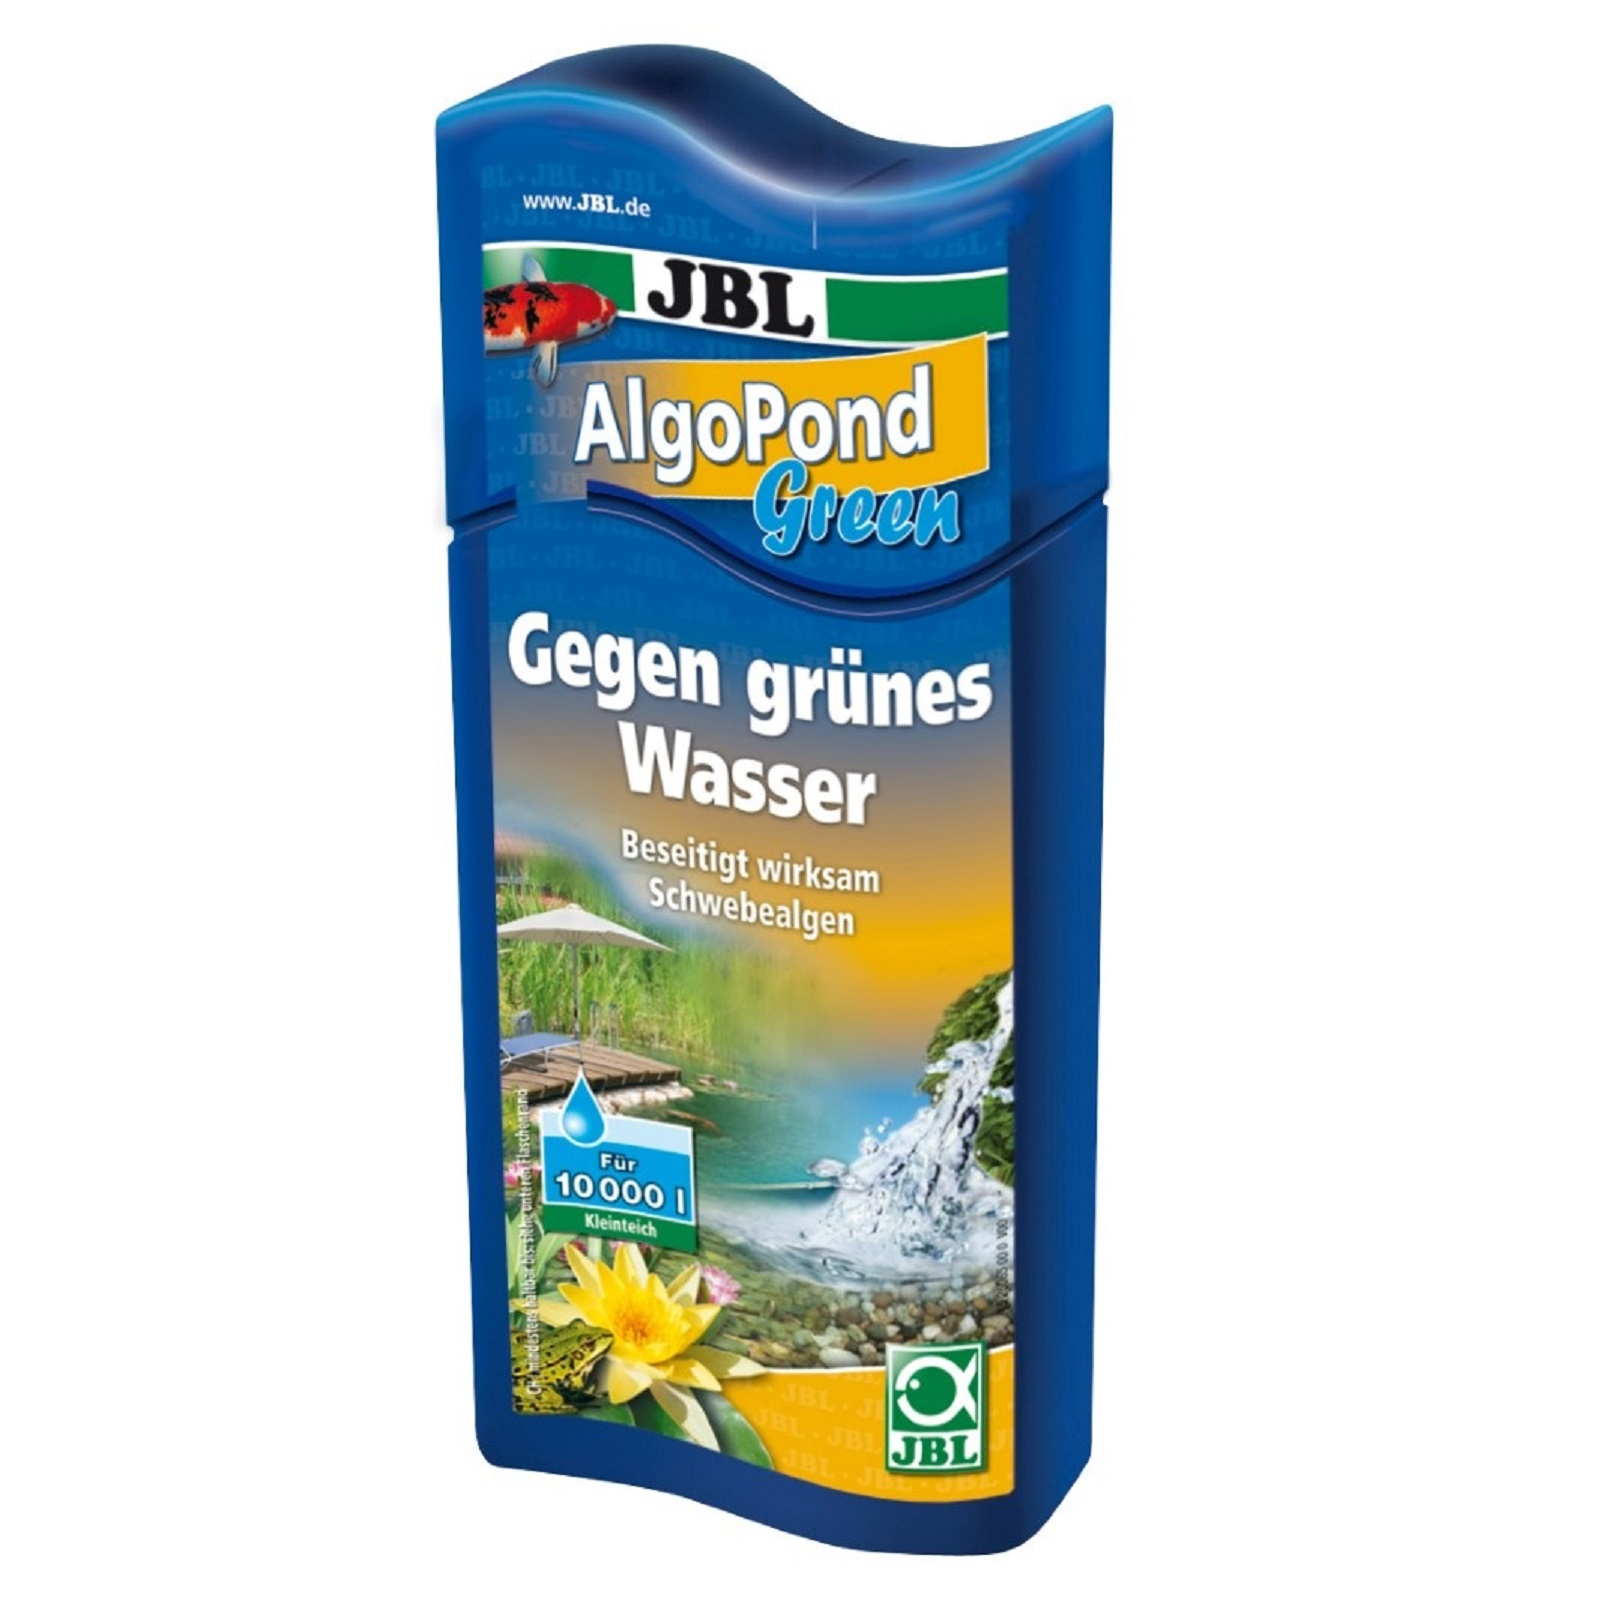 JBL AlgoPond Green 500 ml gegen grünes Wasser löst Algenprobleme